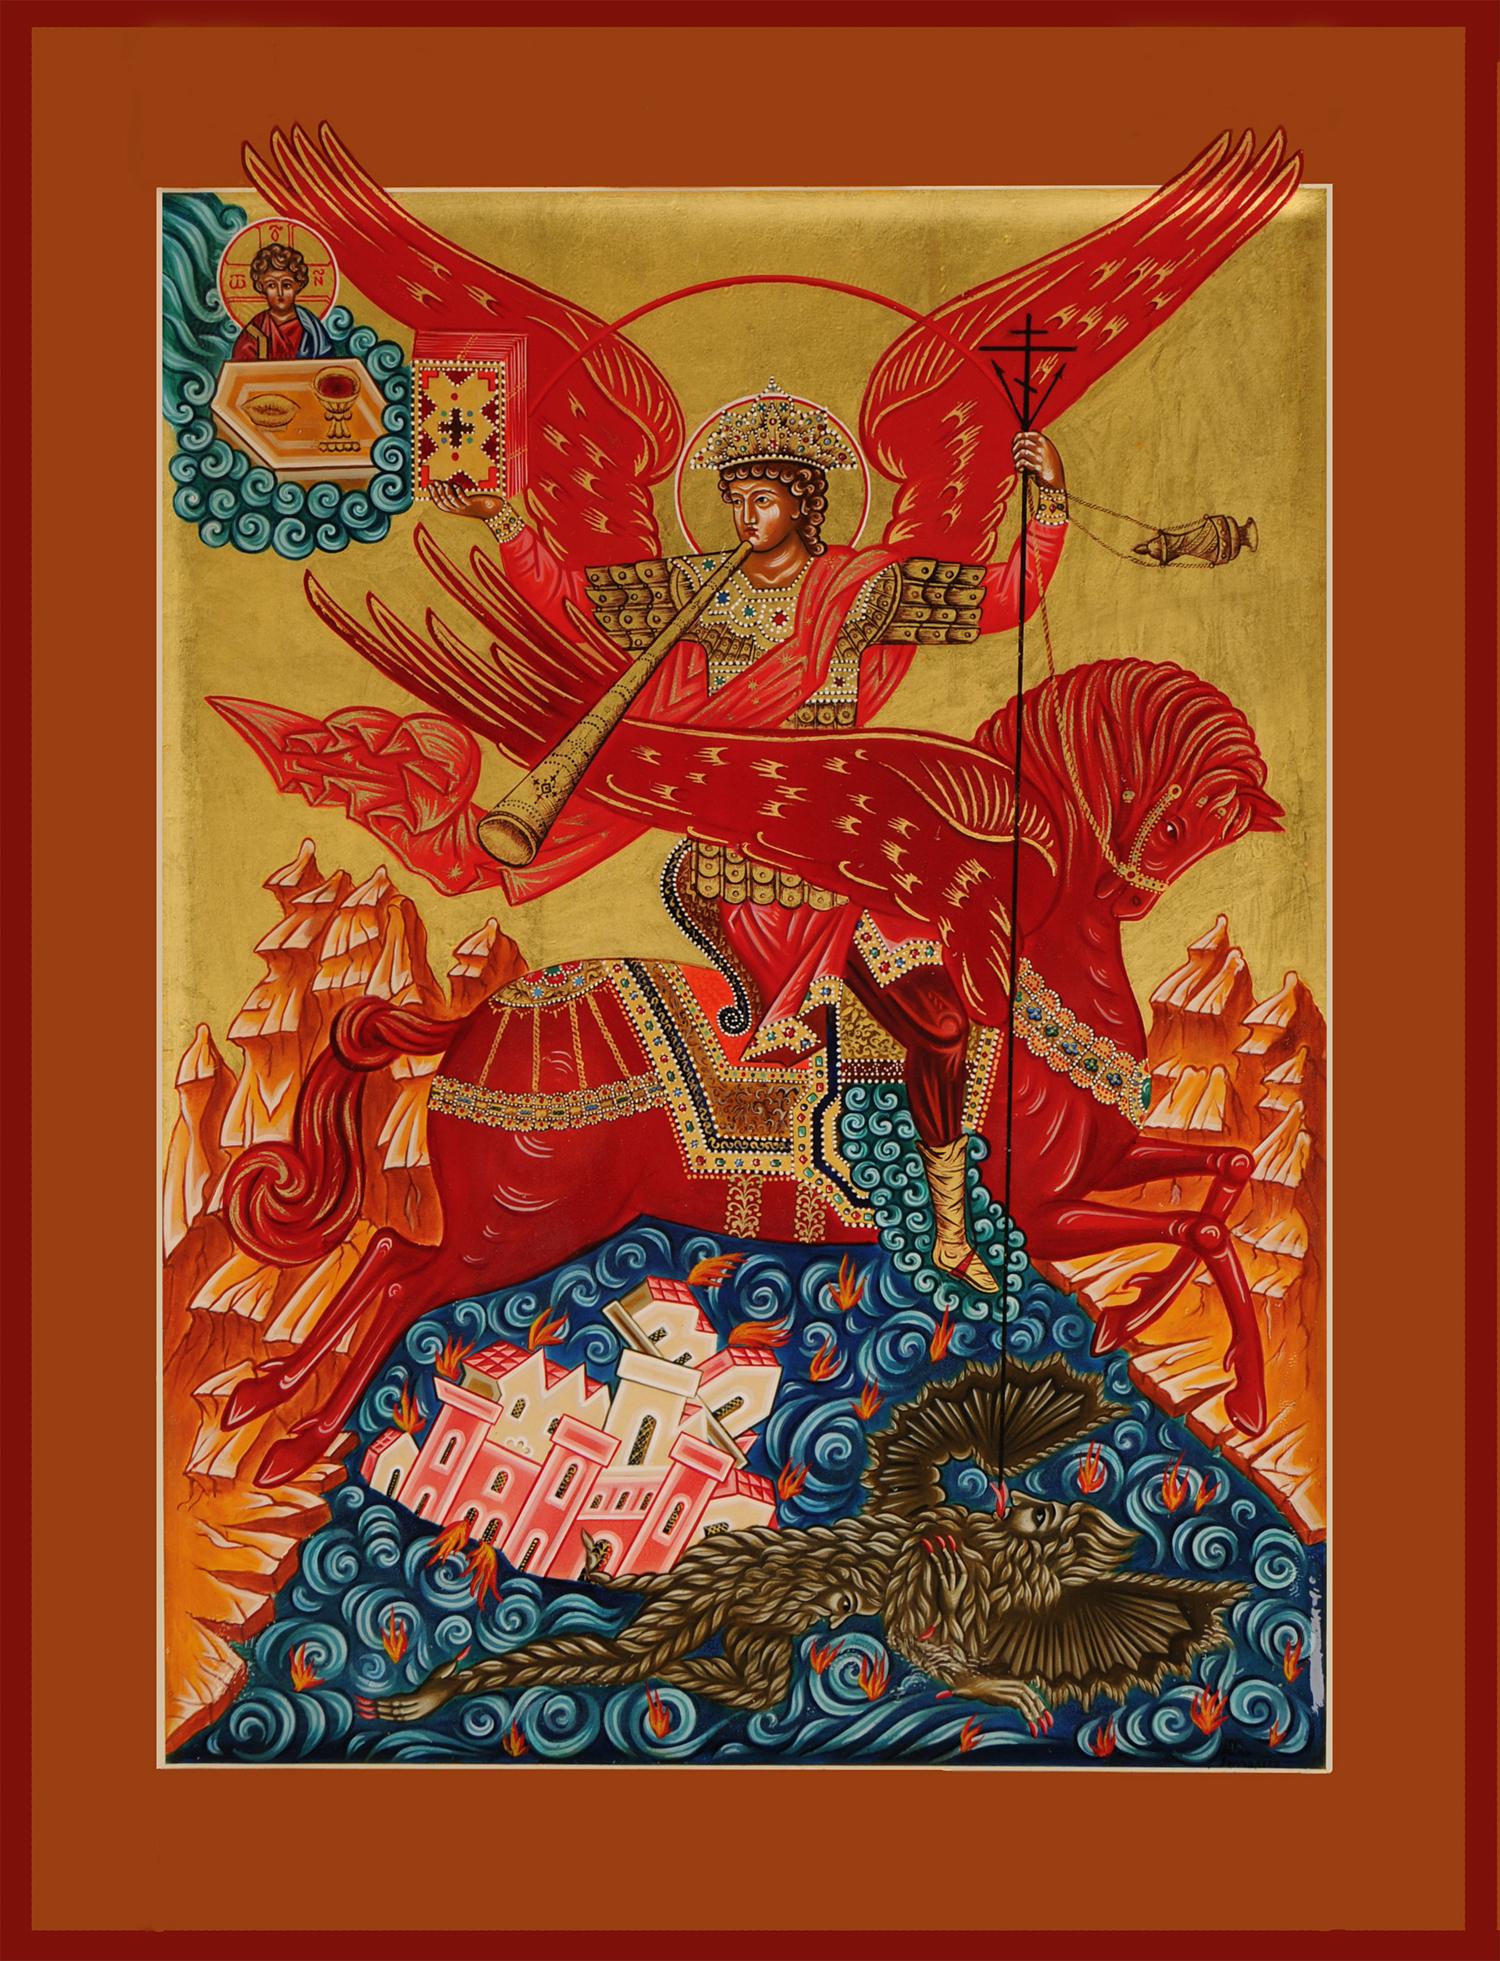 Archangel Michael the Chief Commander